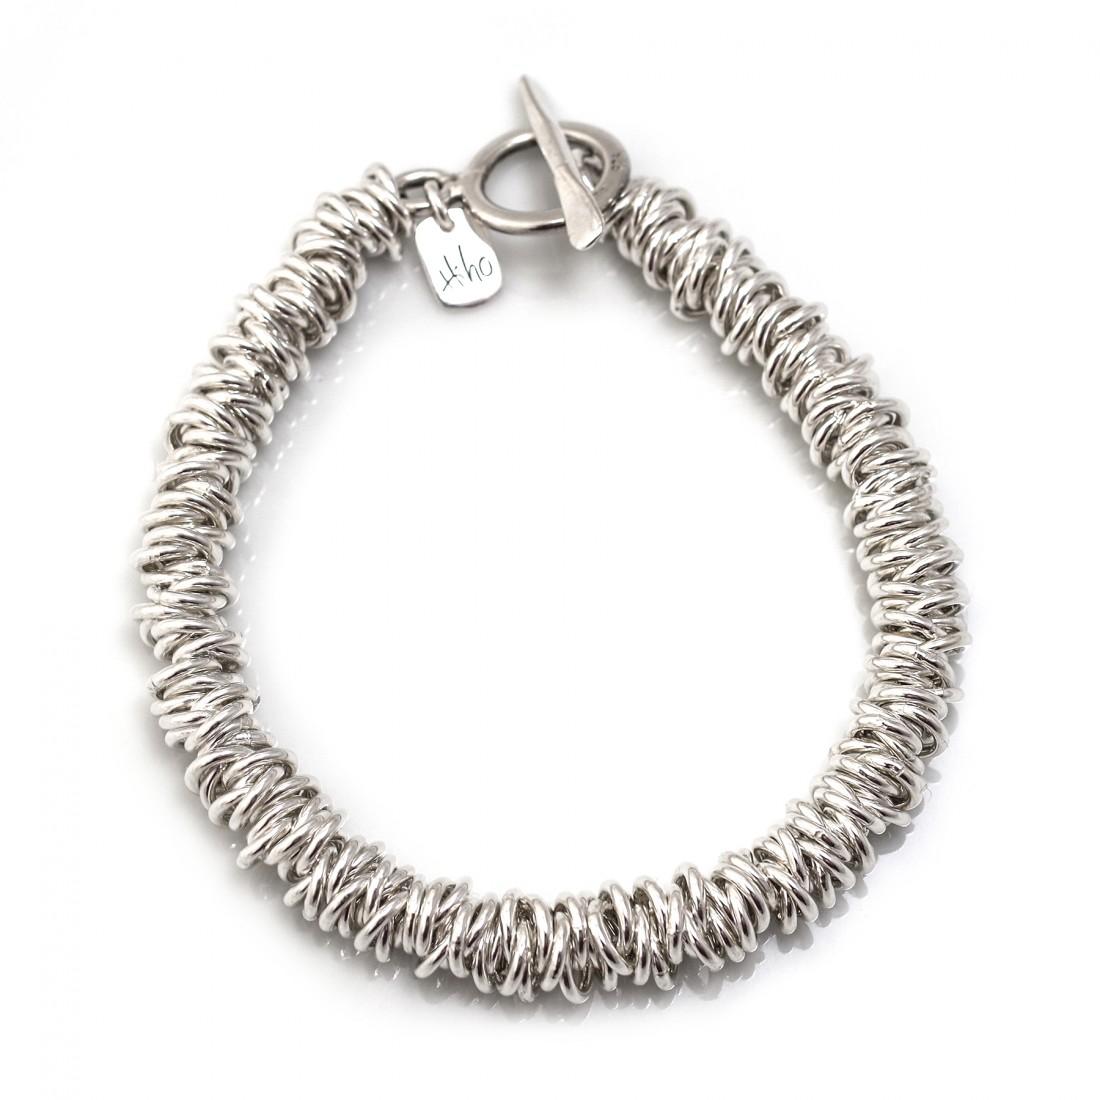 Sterling Silver Classic Multi-Links Bracelet